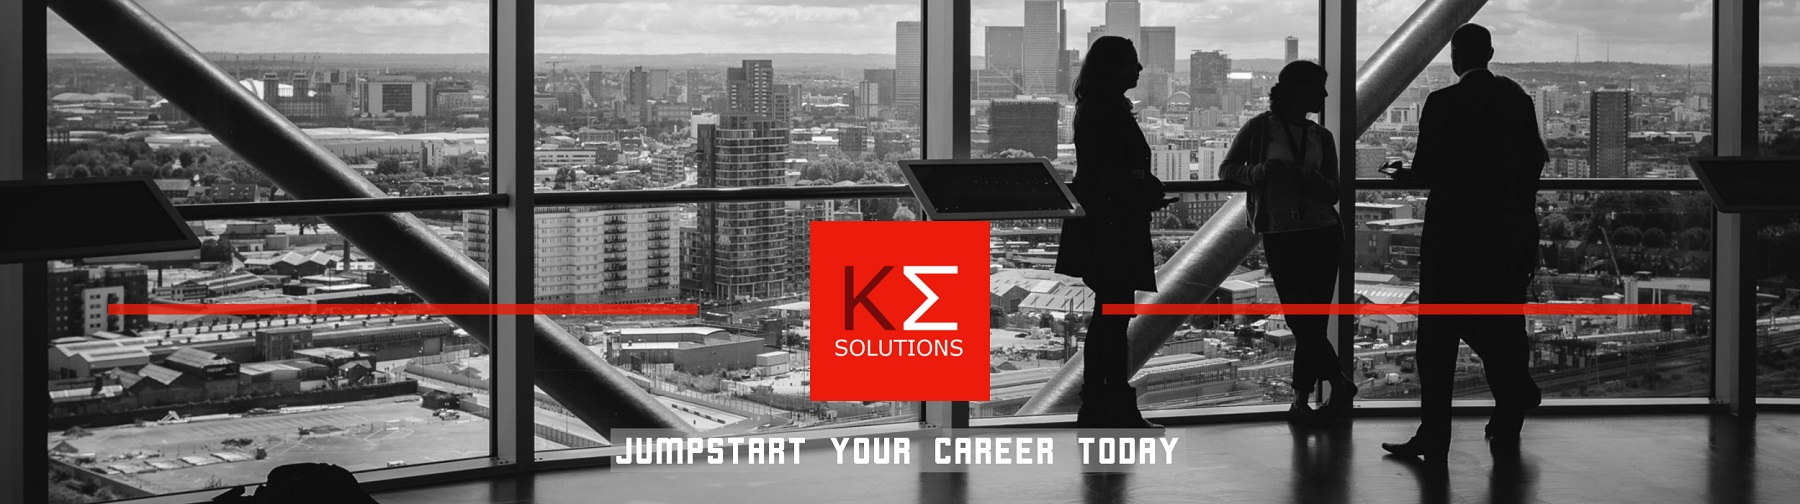 KE Solutions Website - Photo Slider 1 - 1800